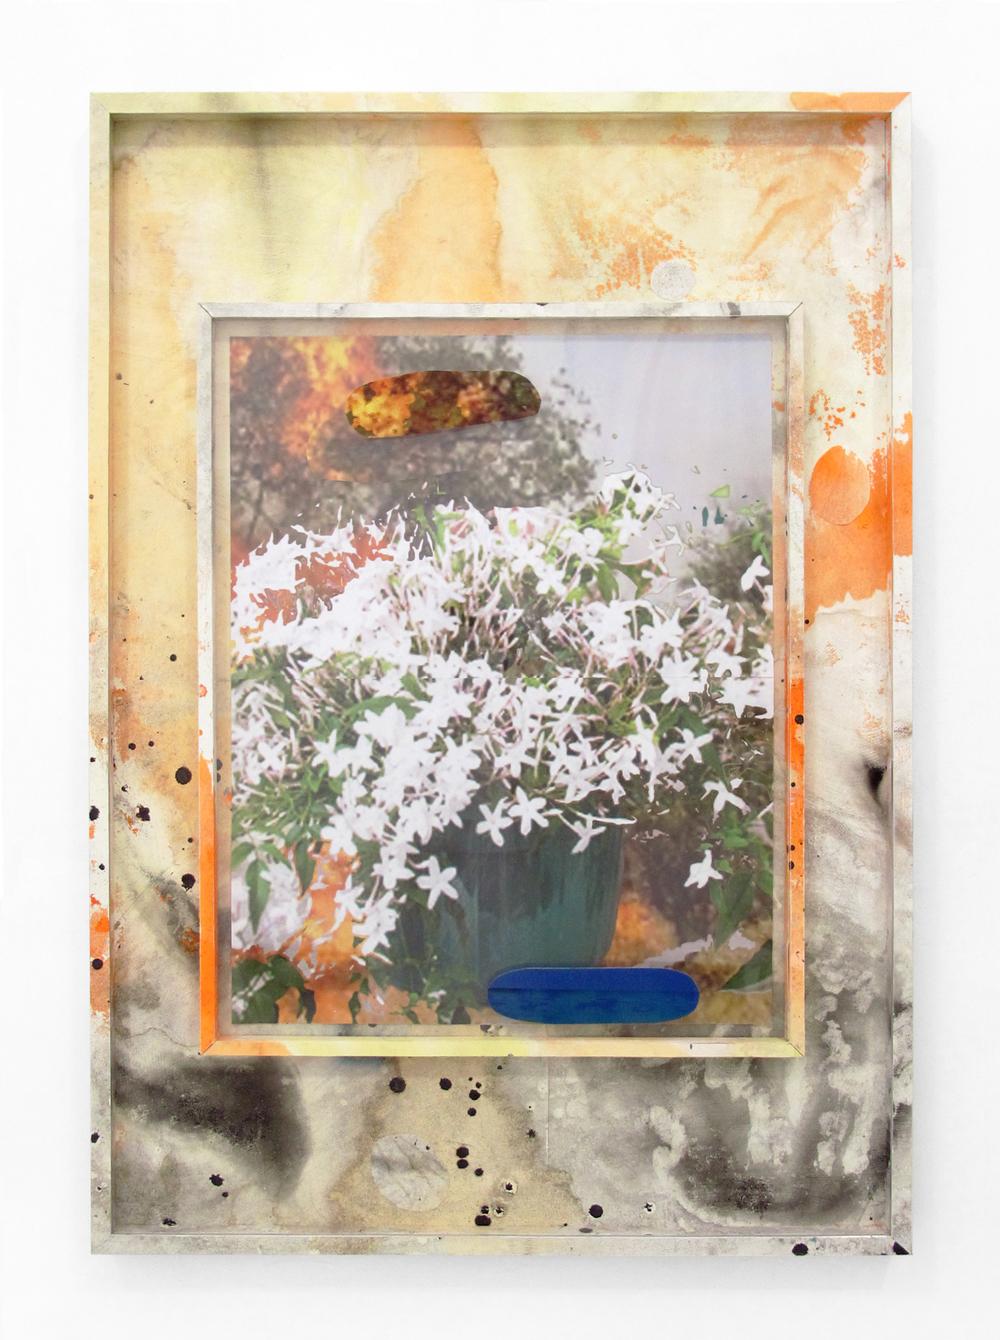 "Backyard Wonders 2, 2013  acrylic, oil, paper, ink jet print, wood, on ikea frame  40.5"" x 28.5"""